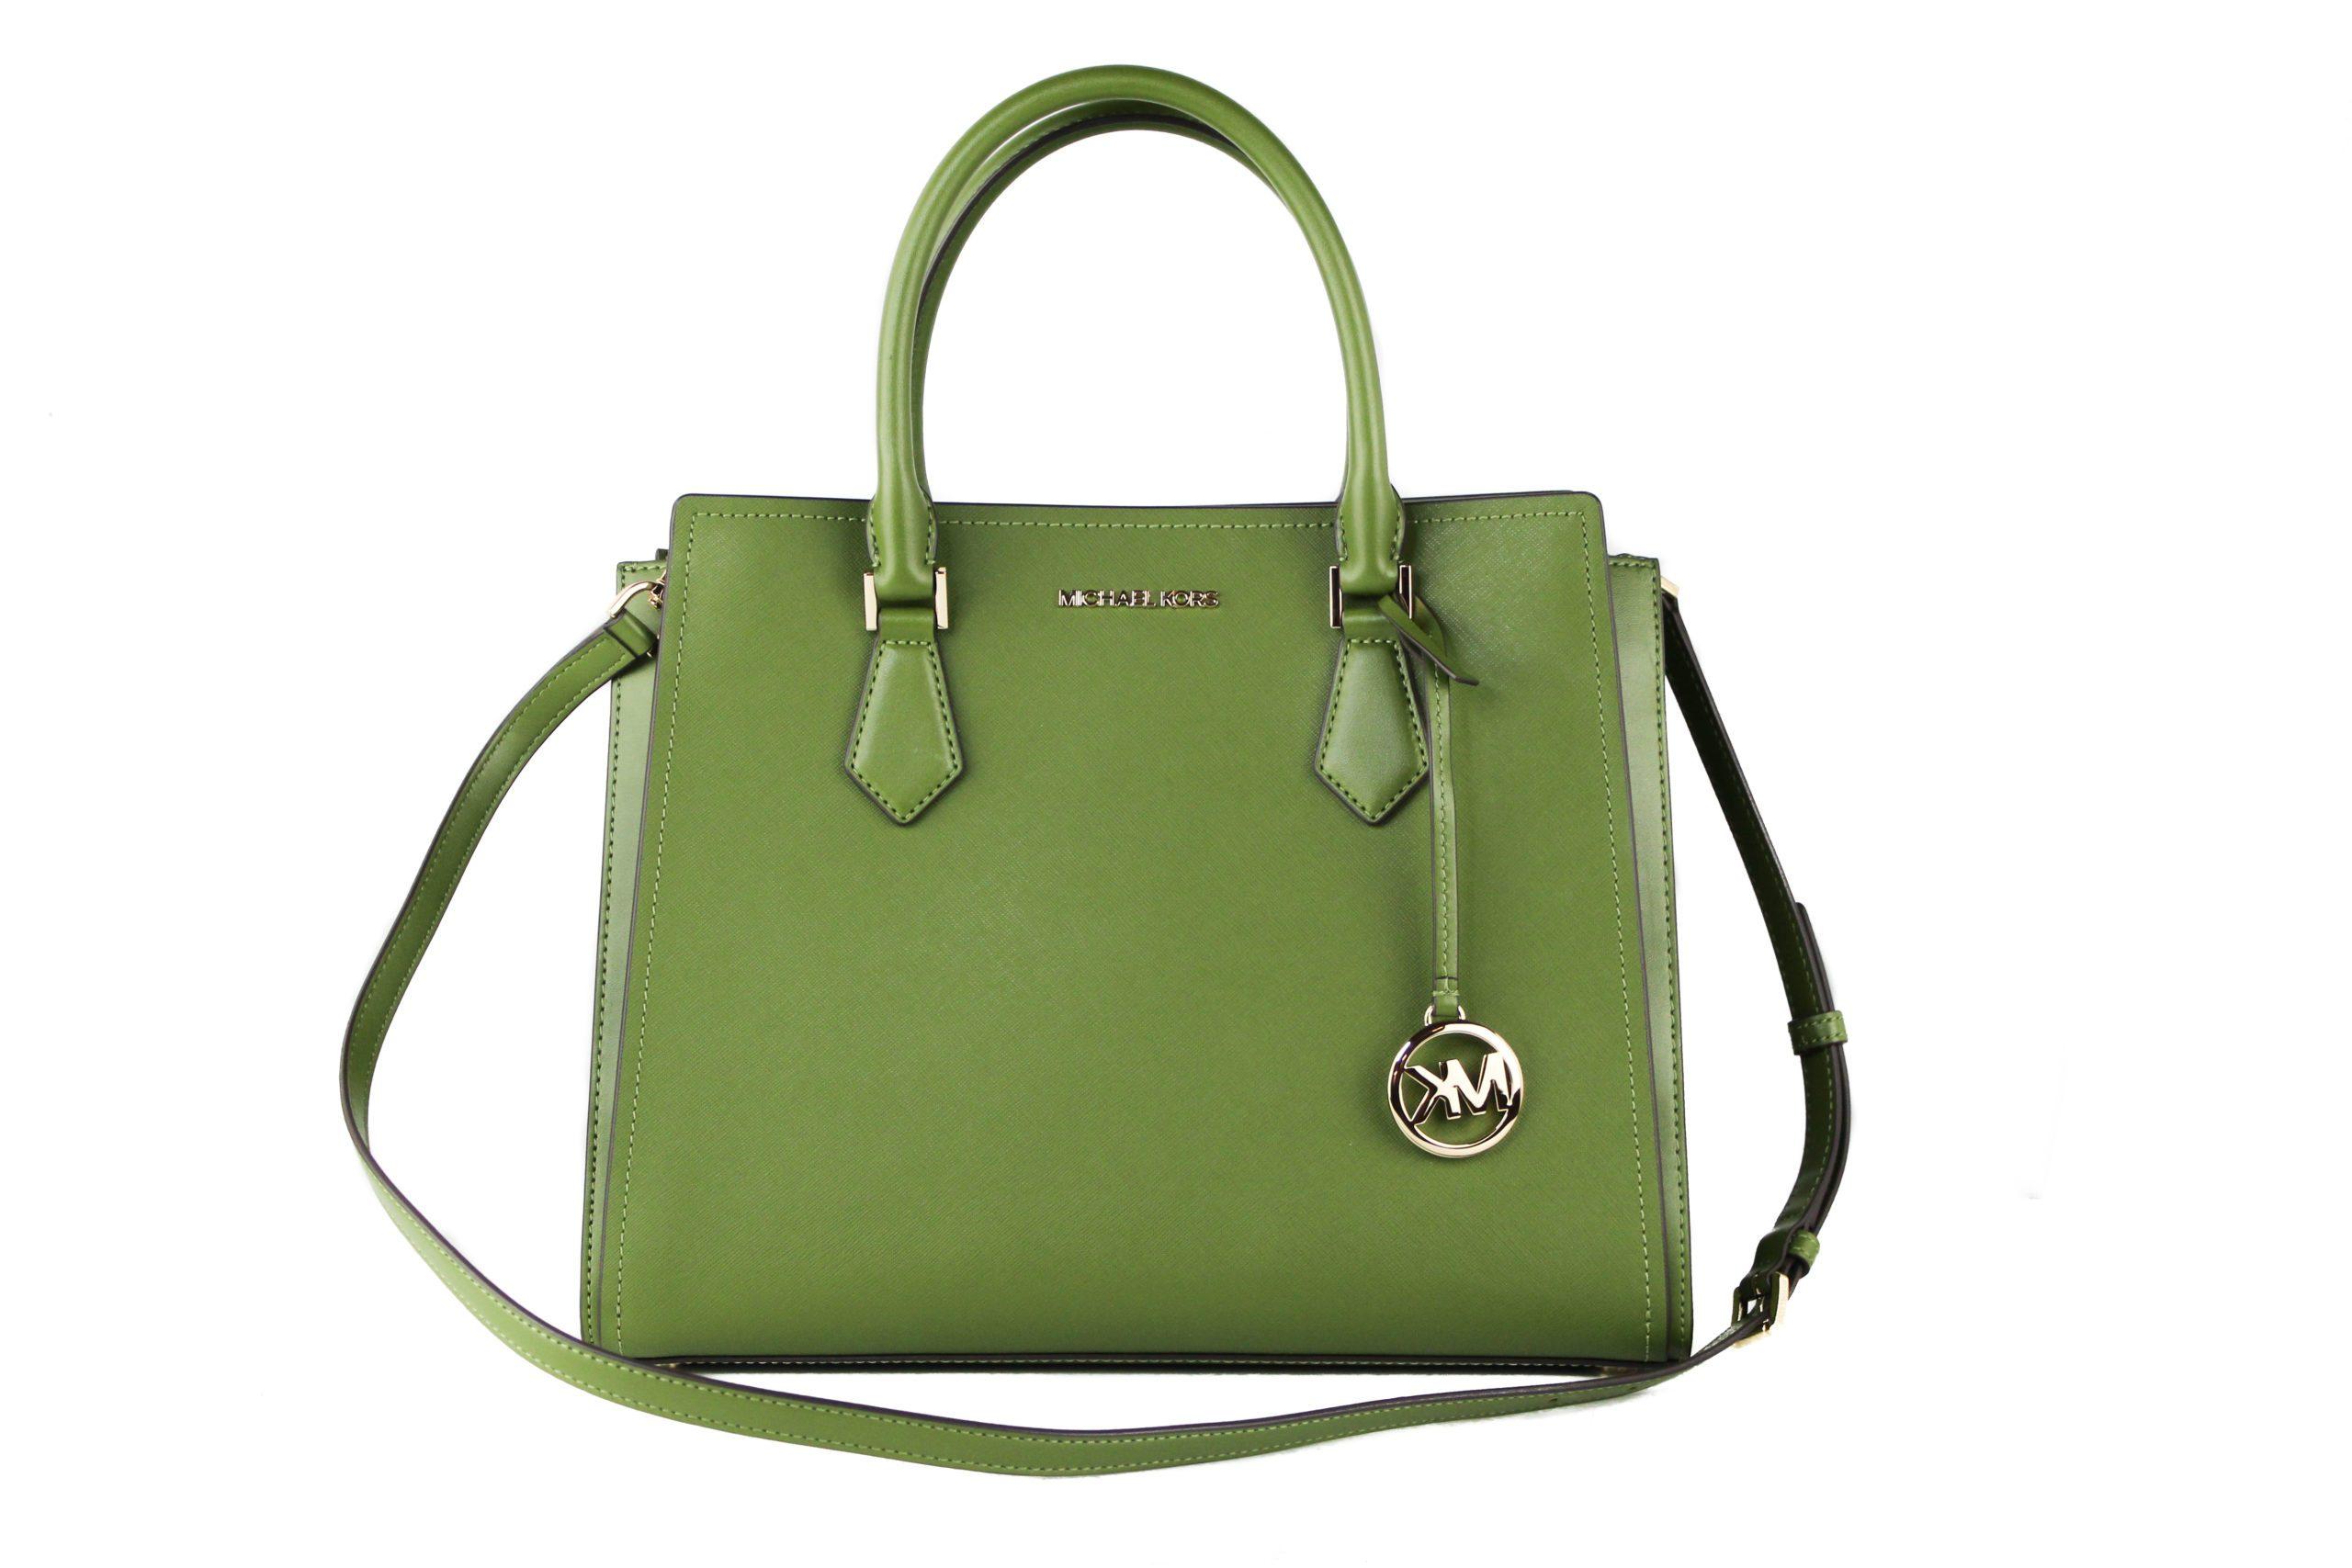 Michael Kors Women's Hope Satchel Bag Green 98336